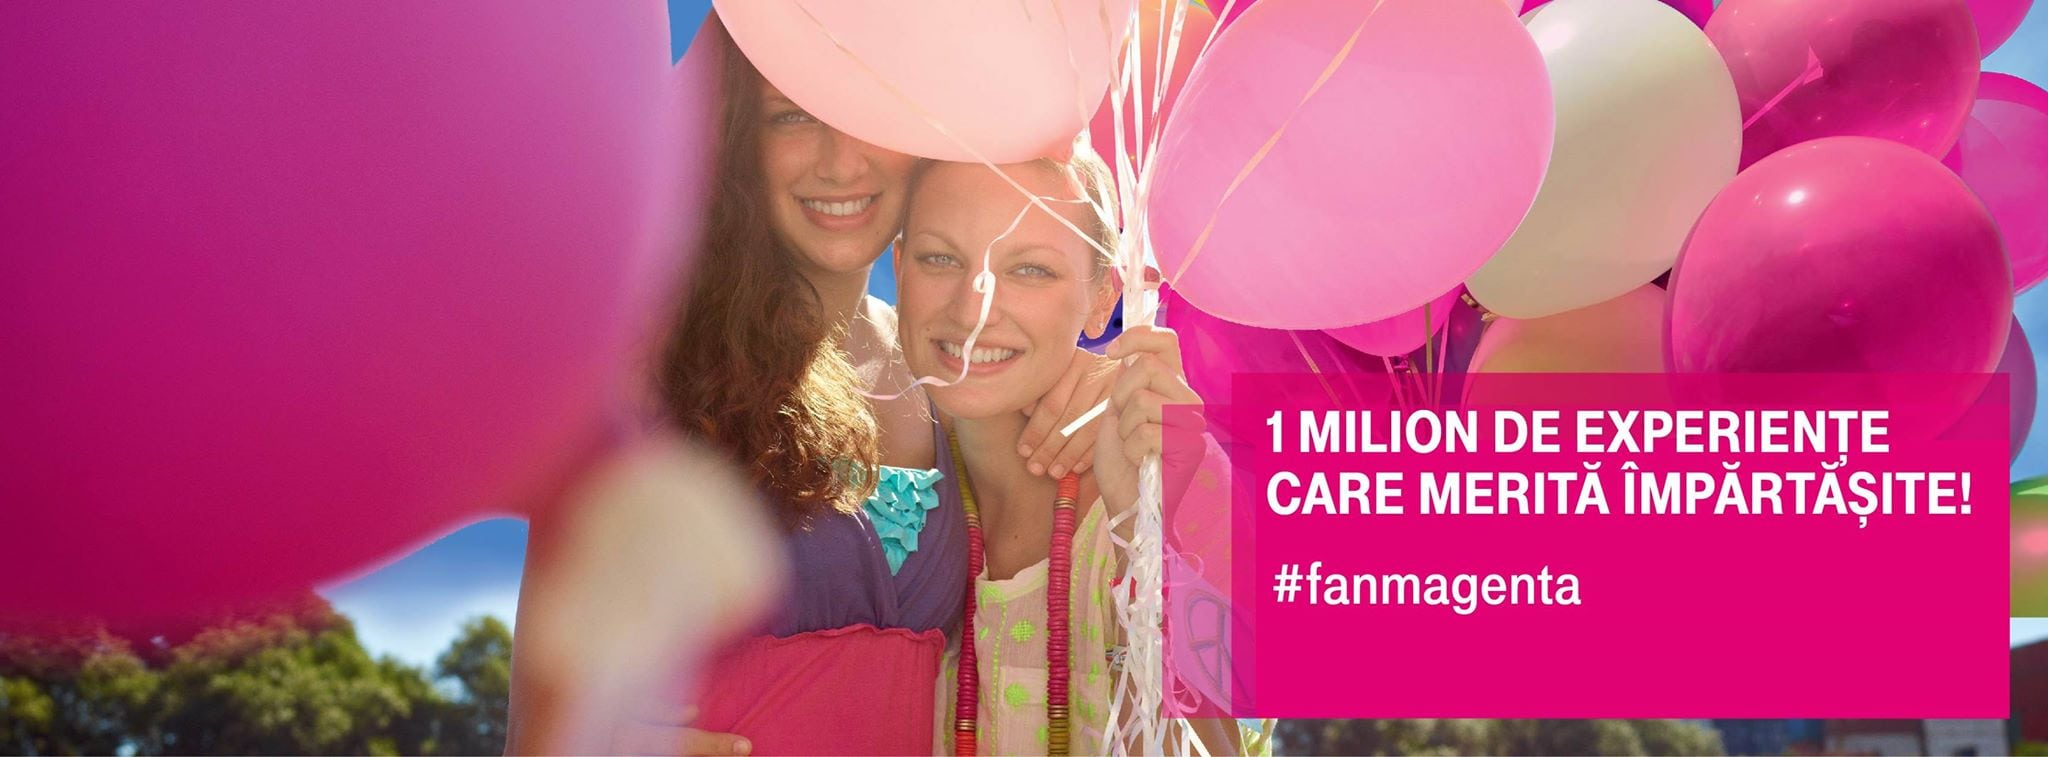 Comunitatea Telekom Romania de pe Facebook a ajuns la 1 milion de fani